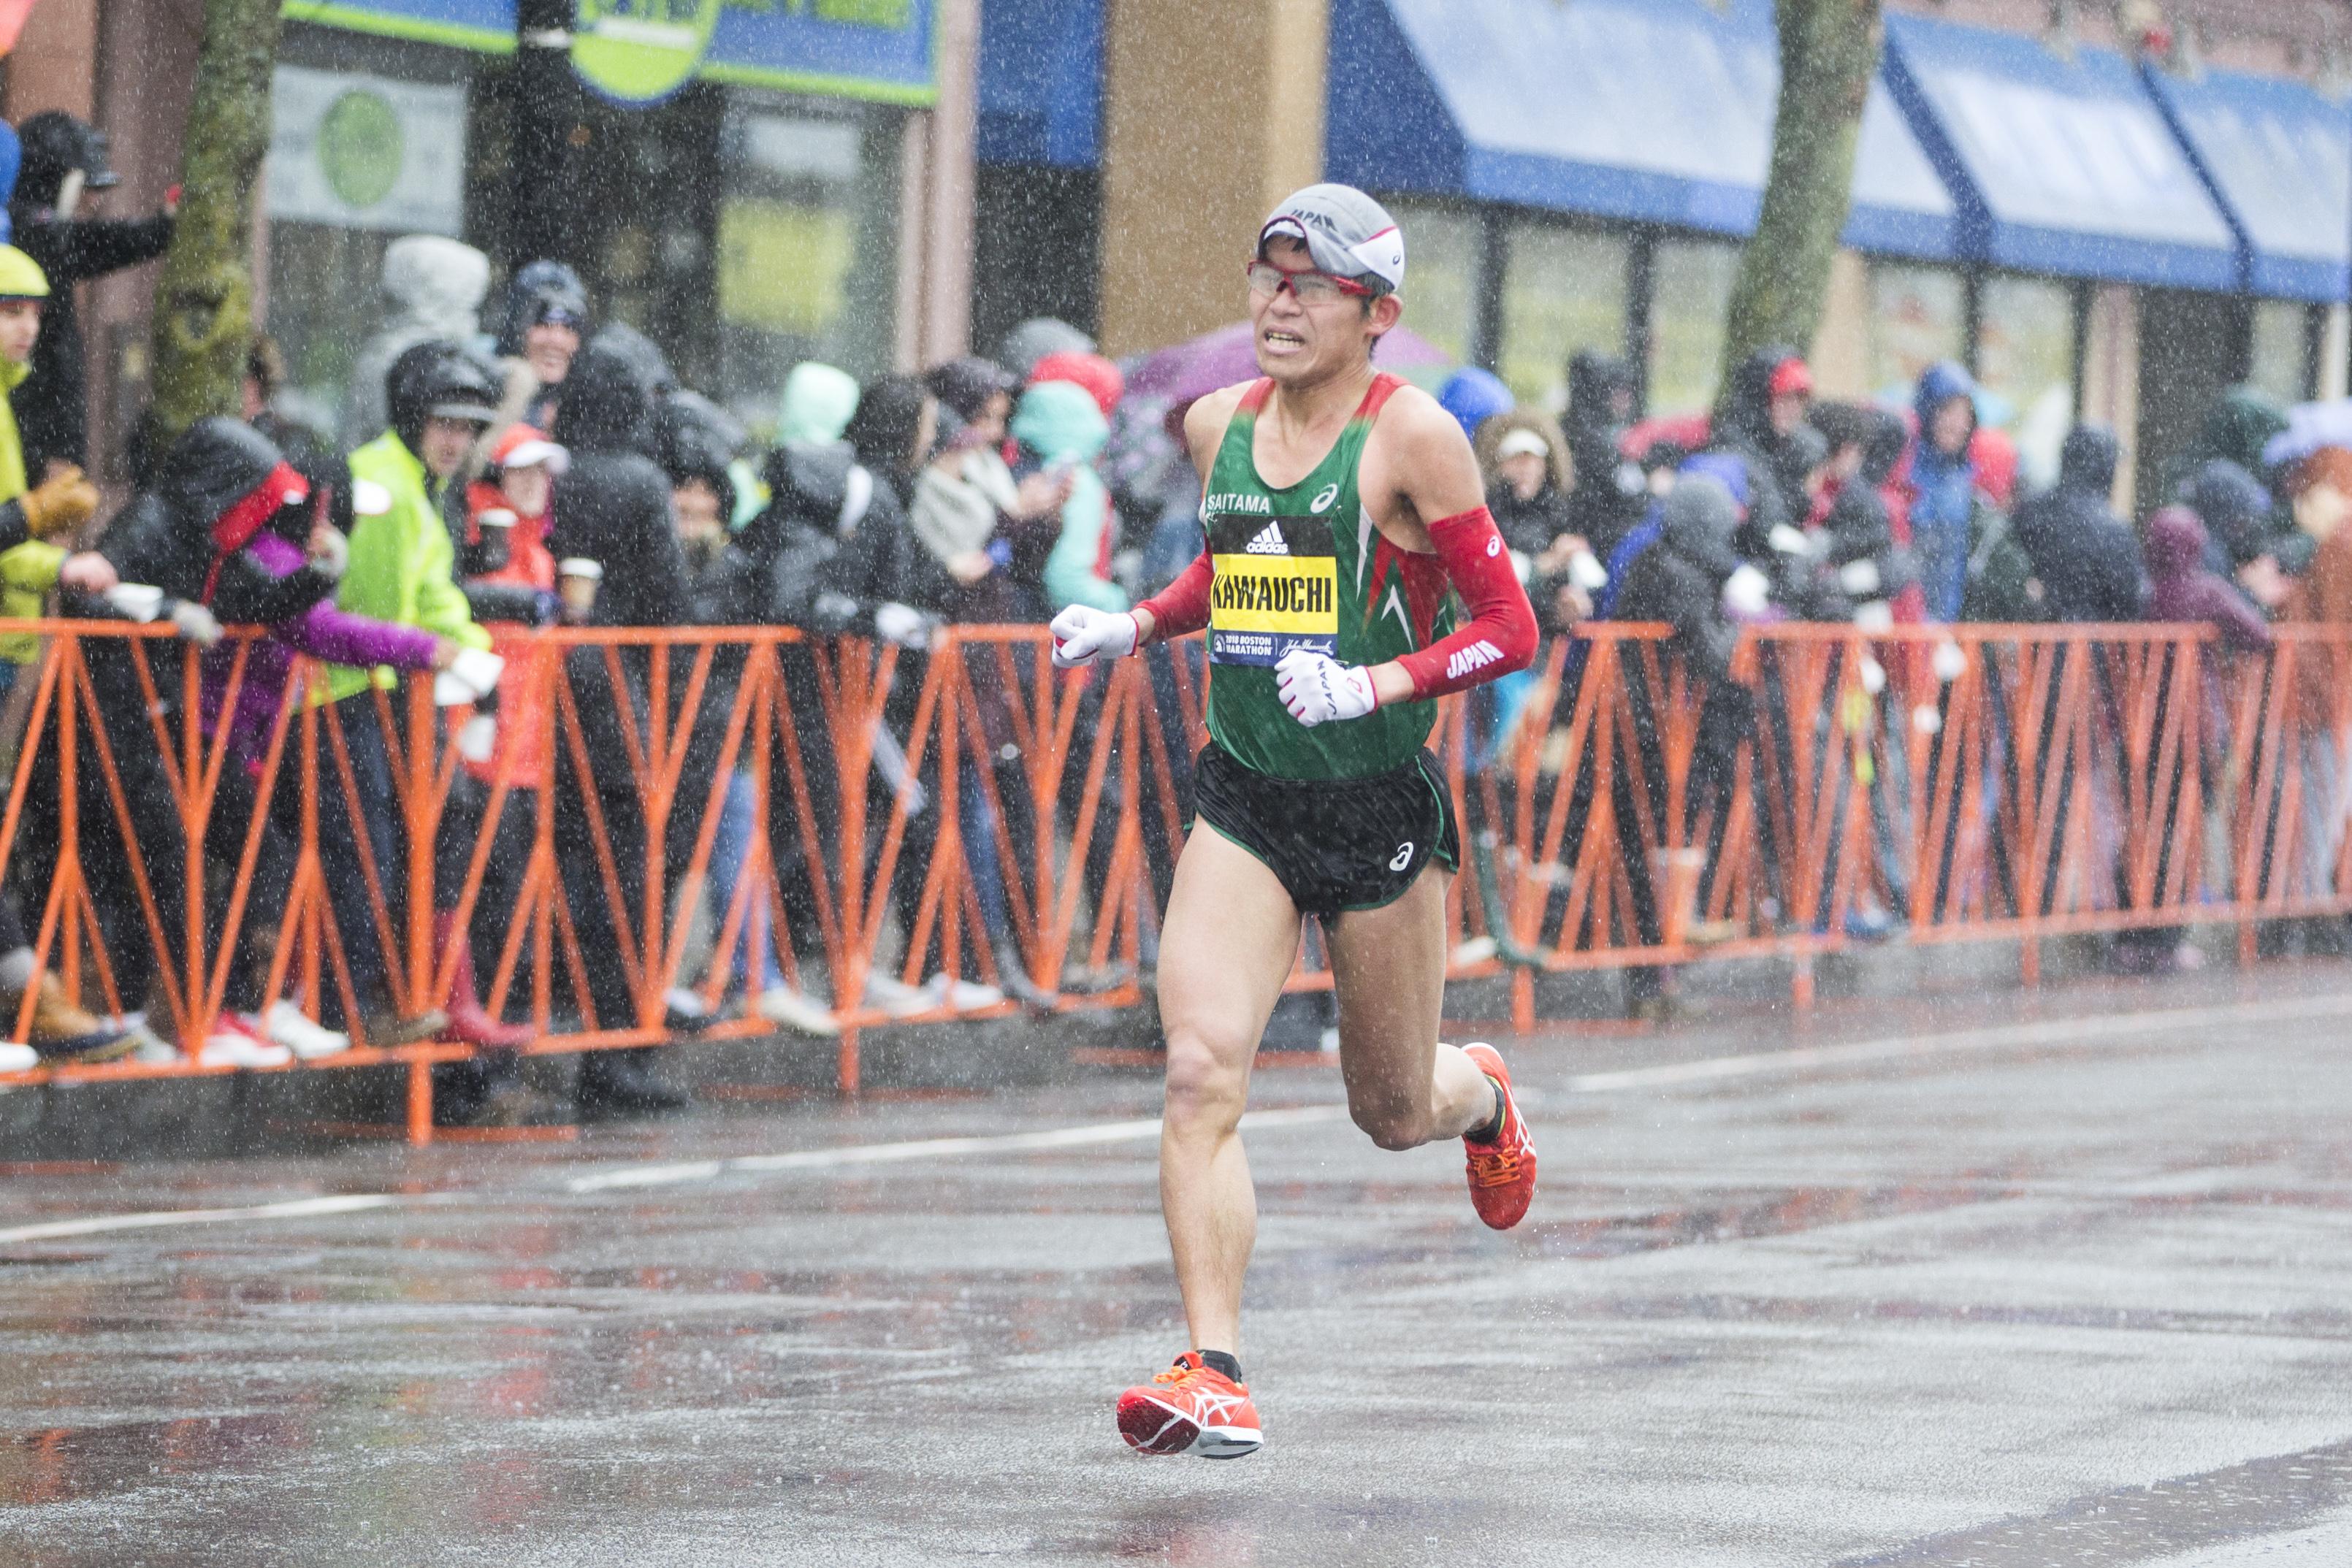 Yuki Kawauchi Marathon